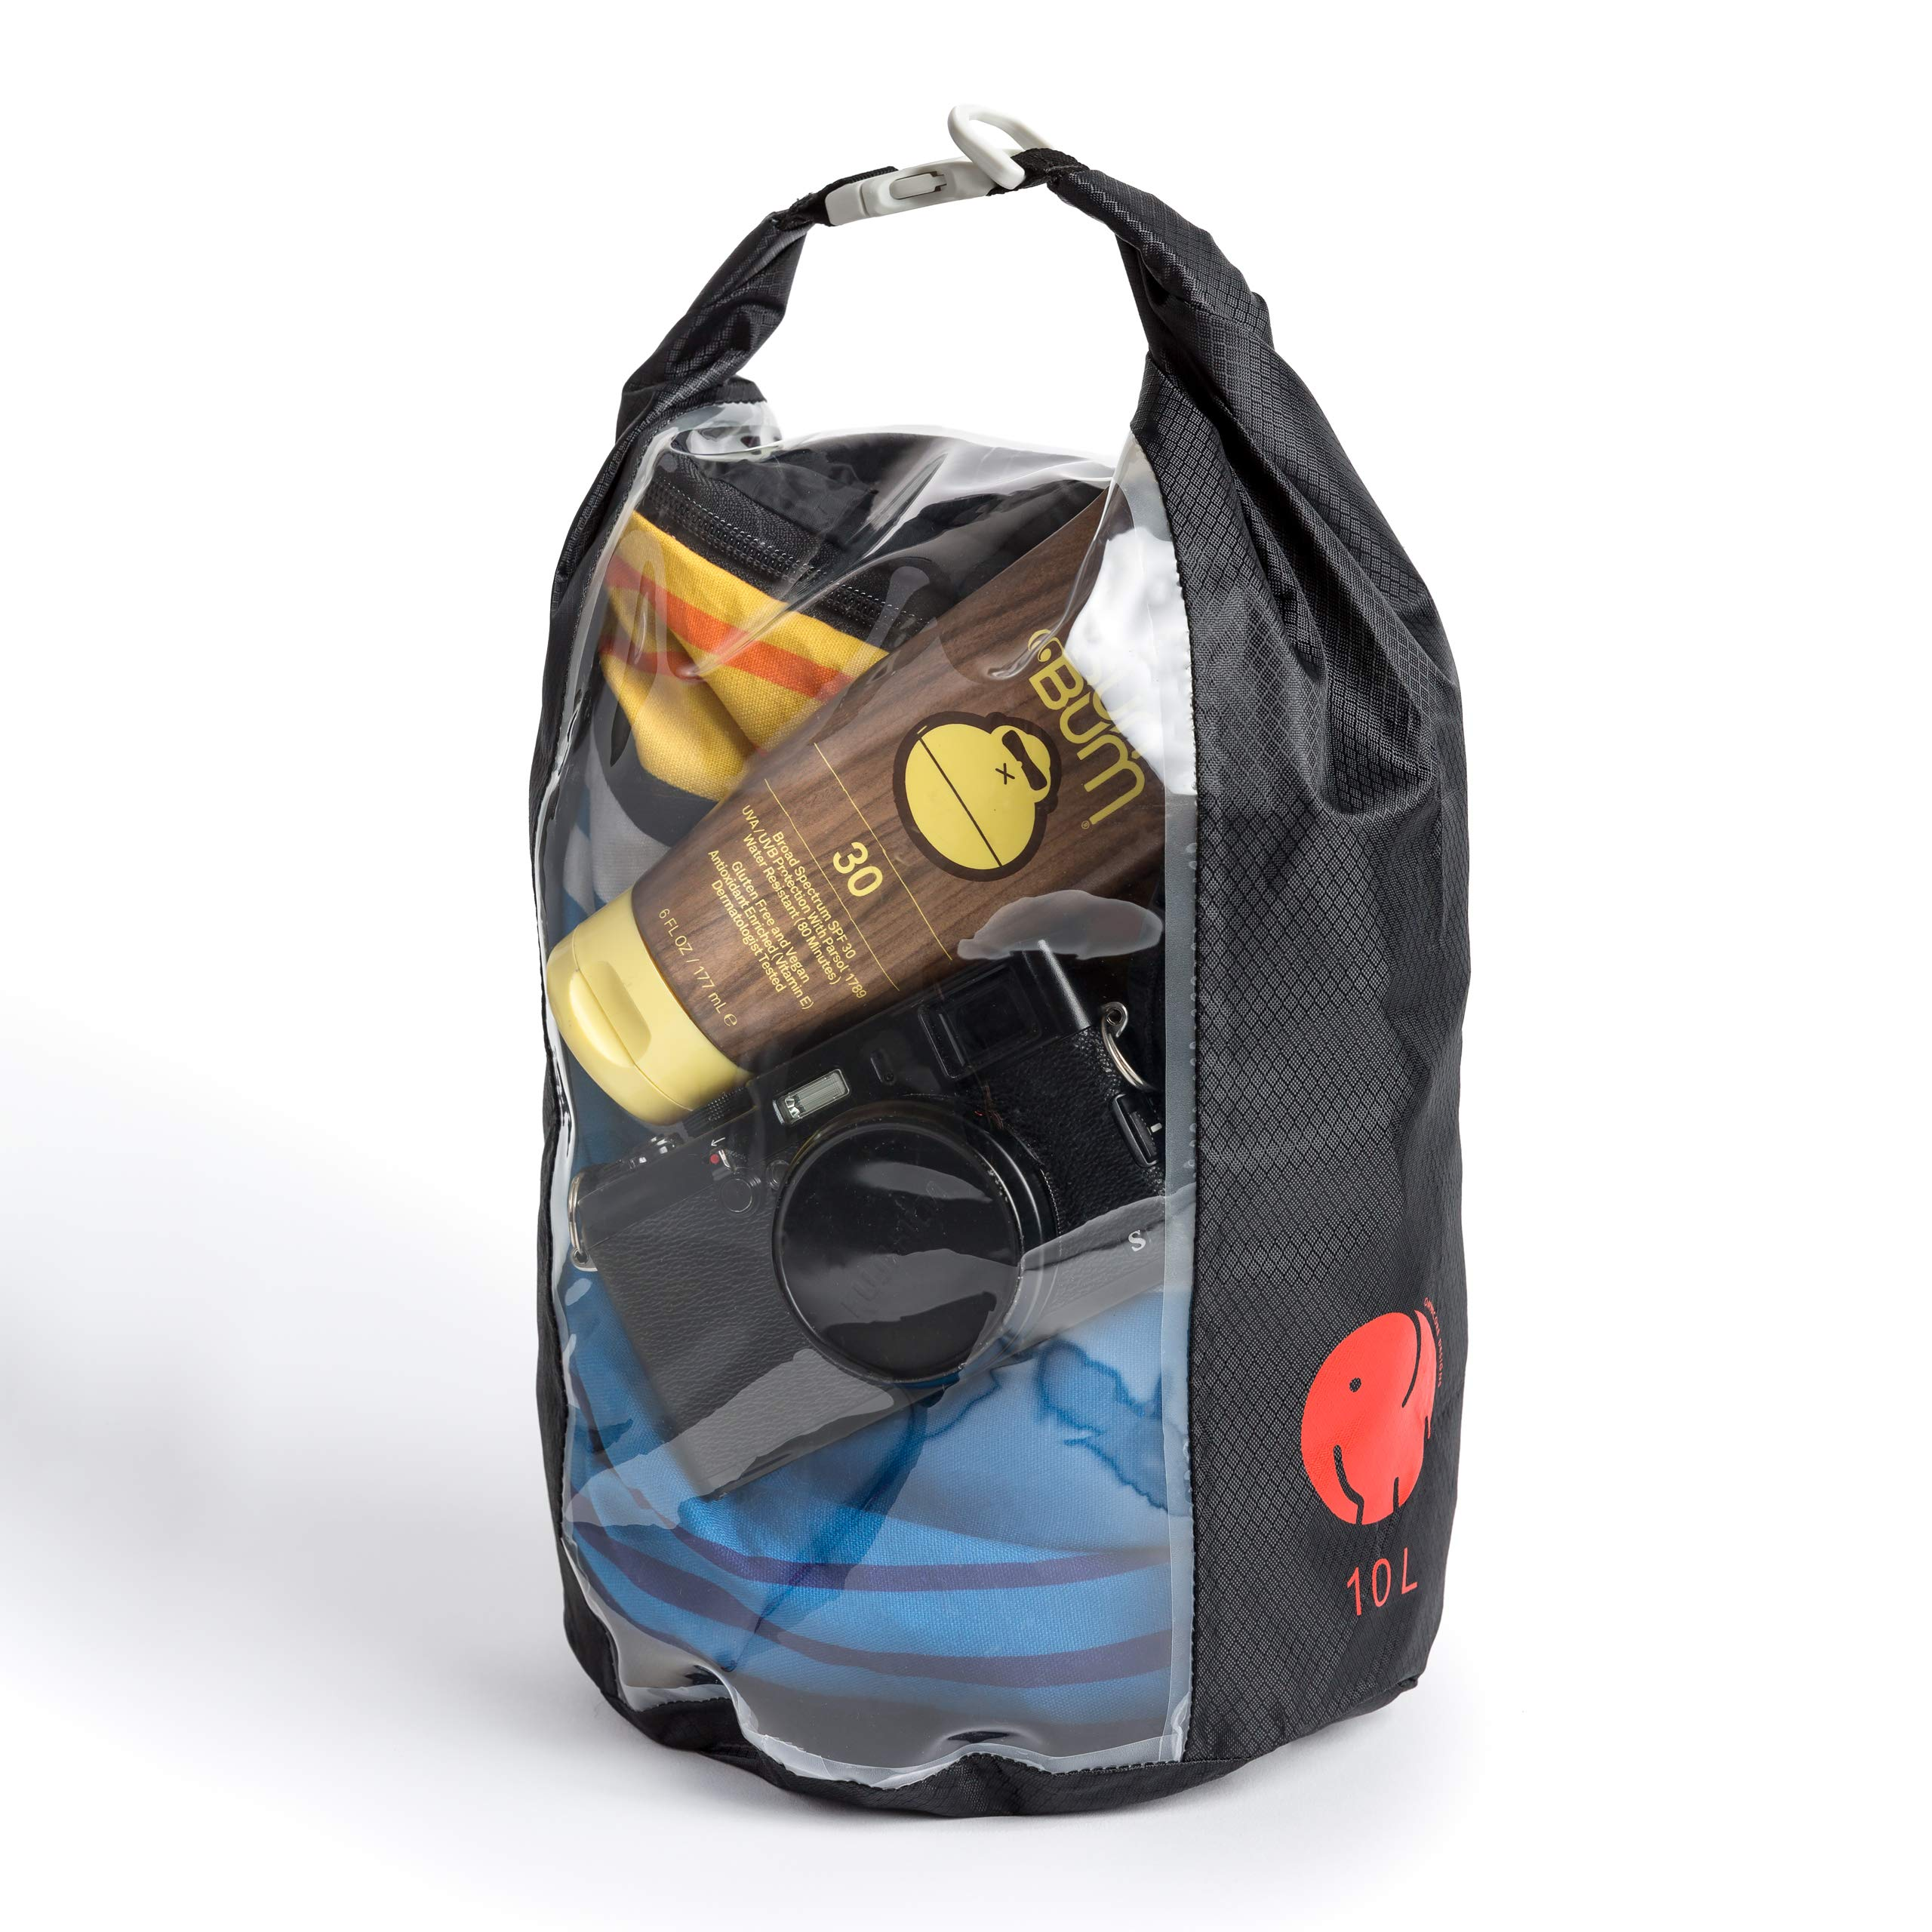 OmniCore Designs Peak-A-Boo Floating Rolltop Waterproof Dry Bag (10L) by OmniCore Designs